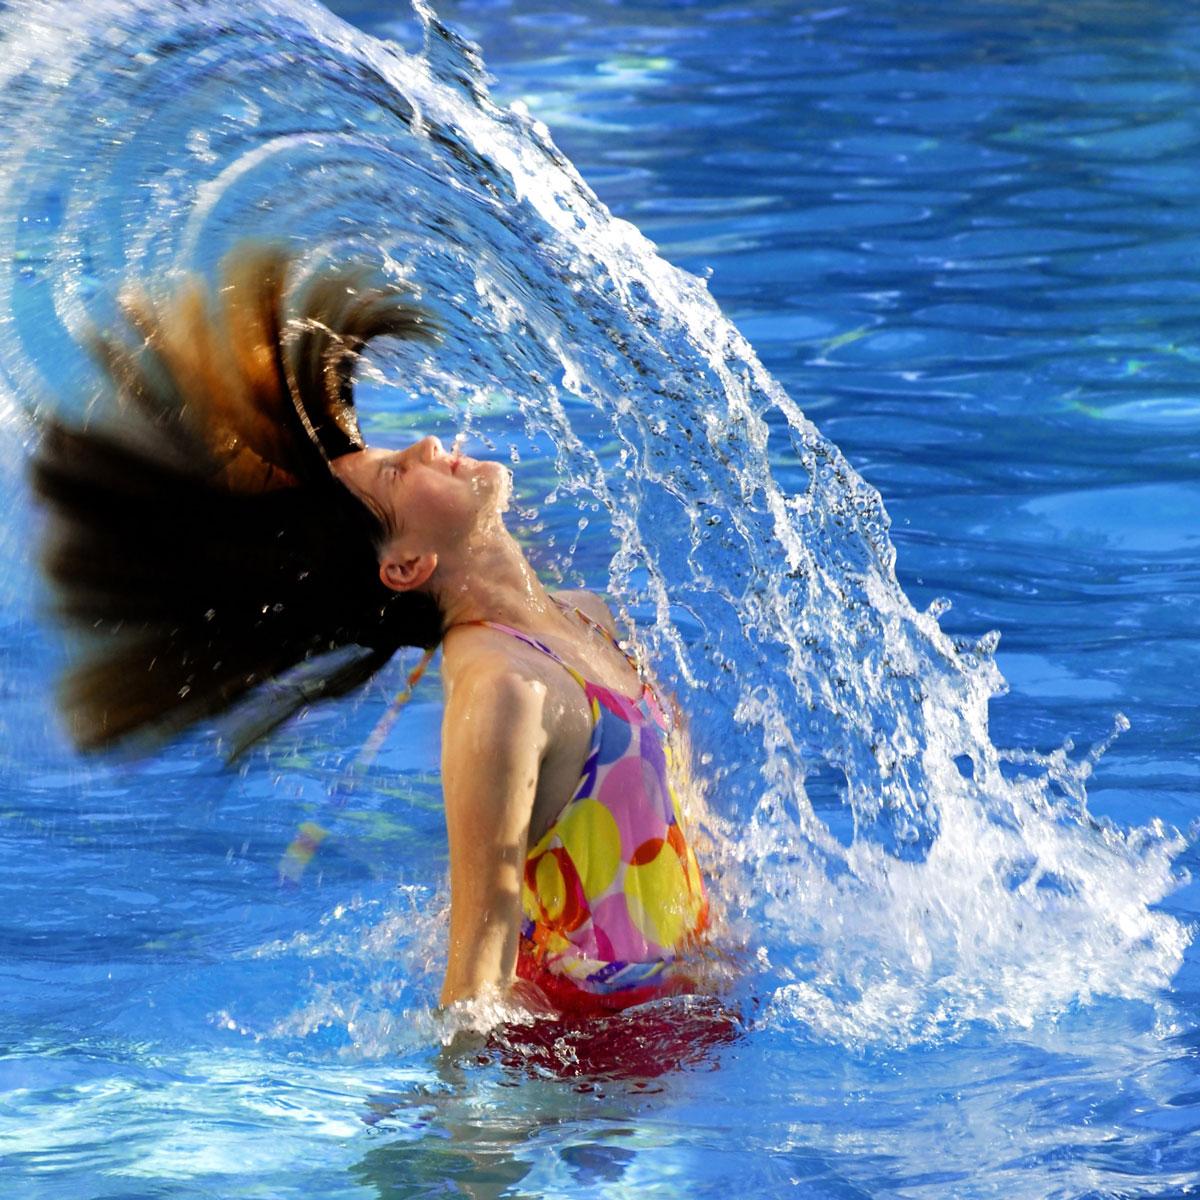 Swimming-Wet-Hair